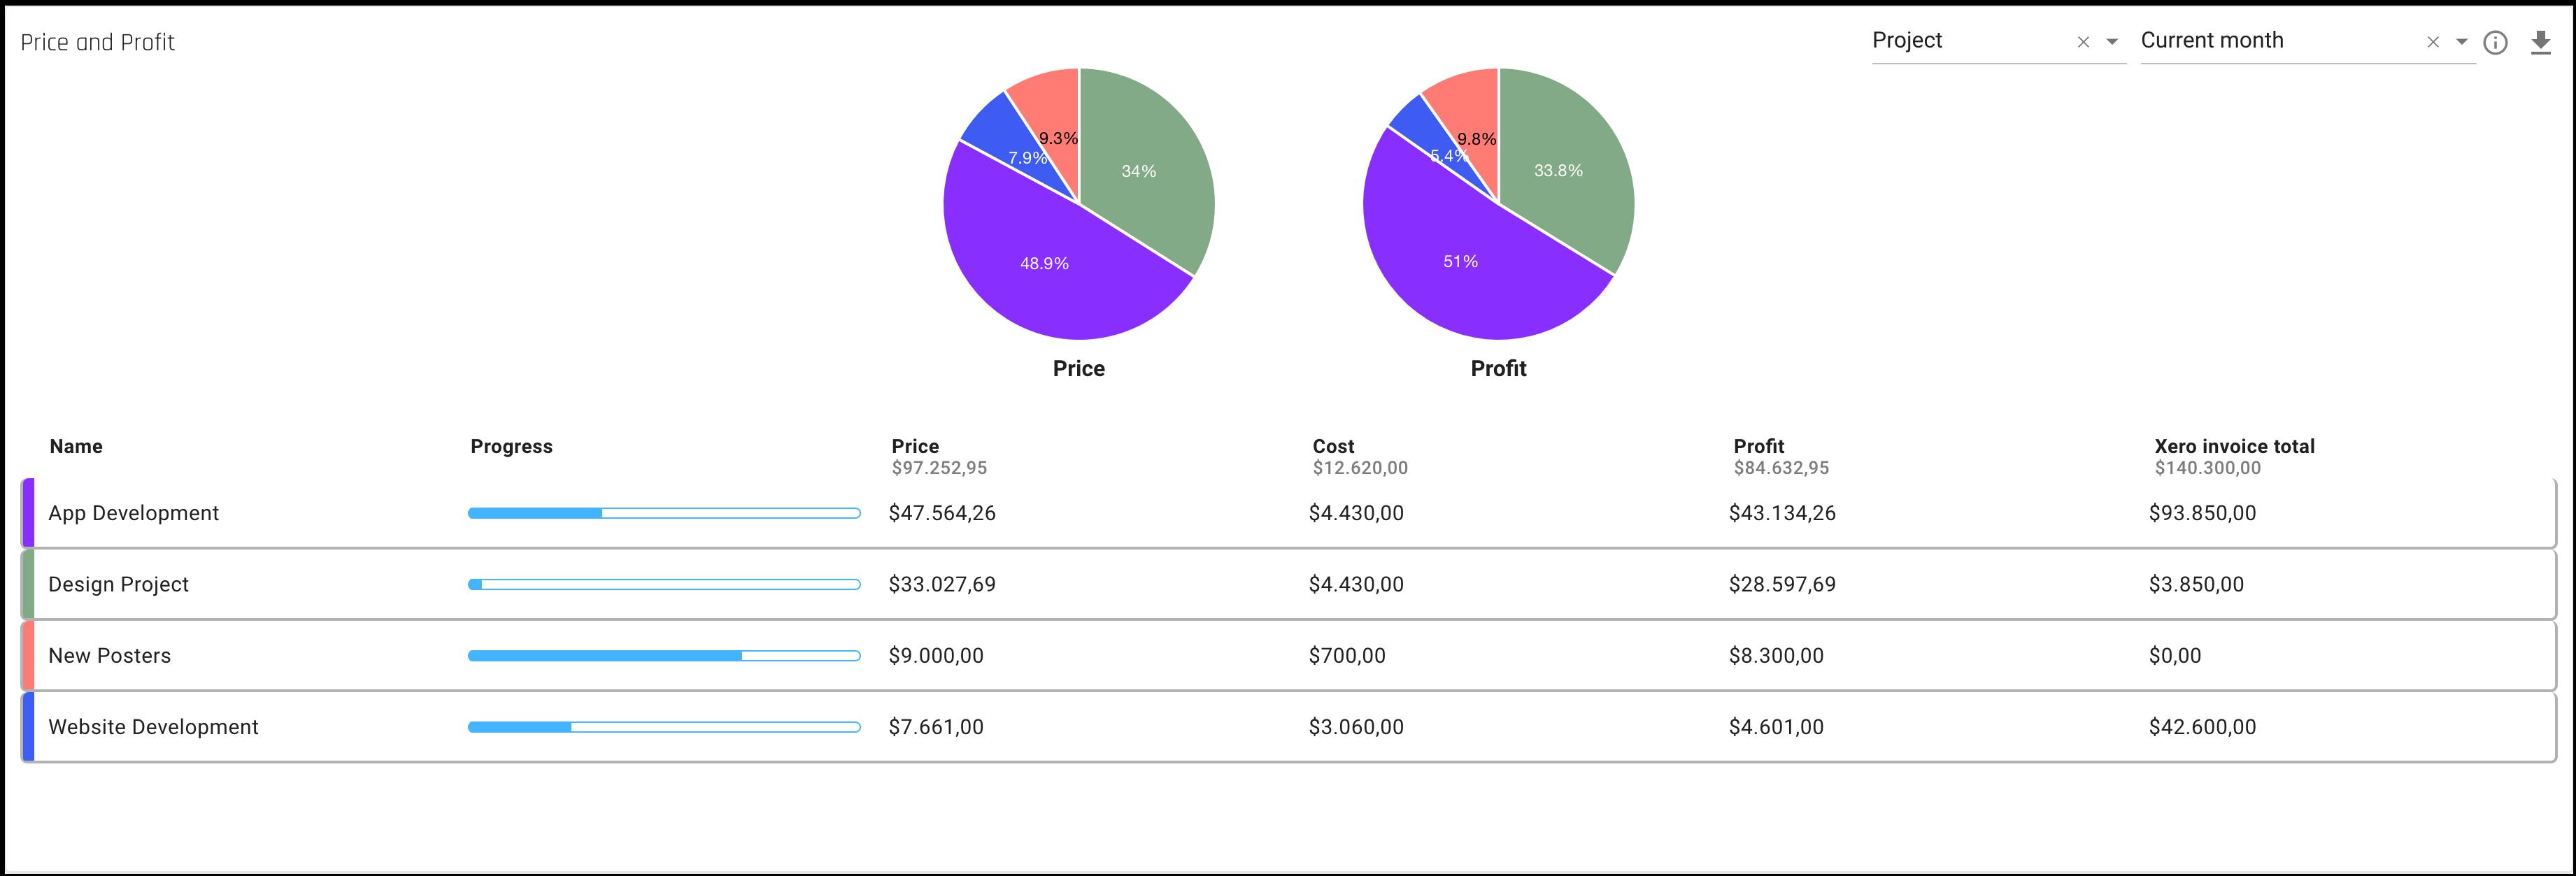 forecast_insights-priceandprofit-xero